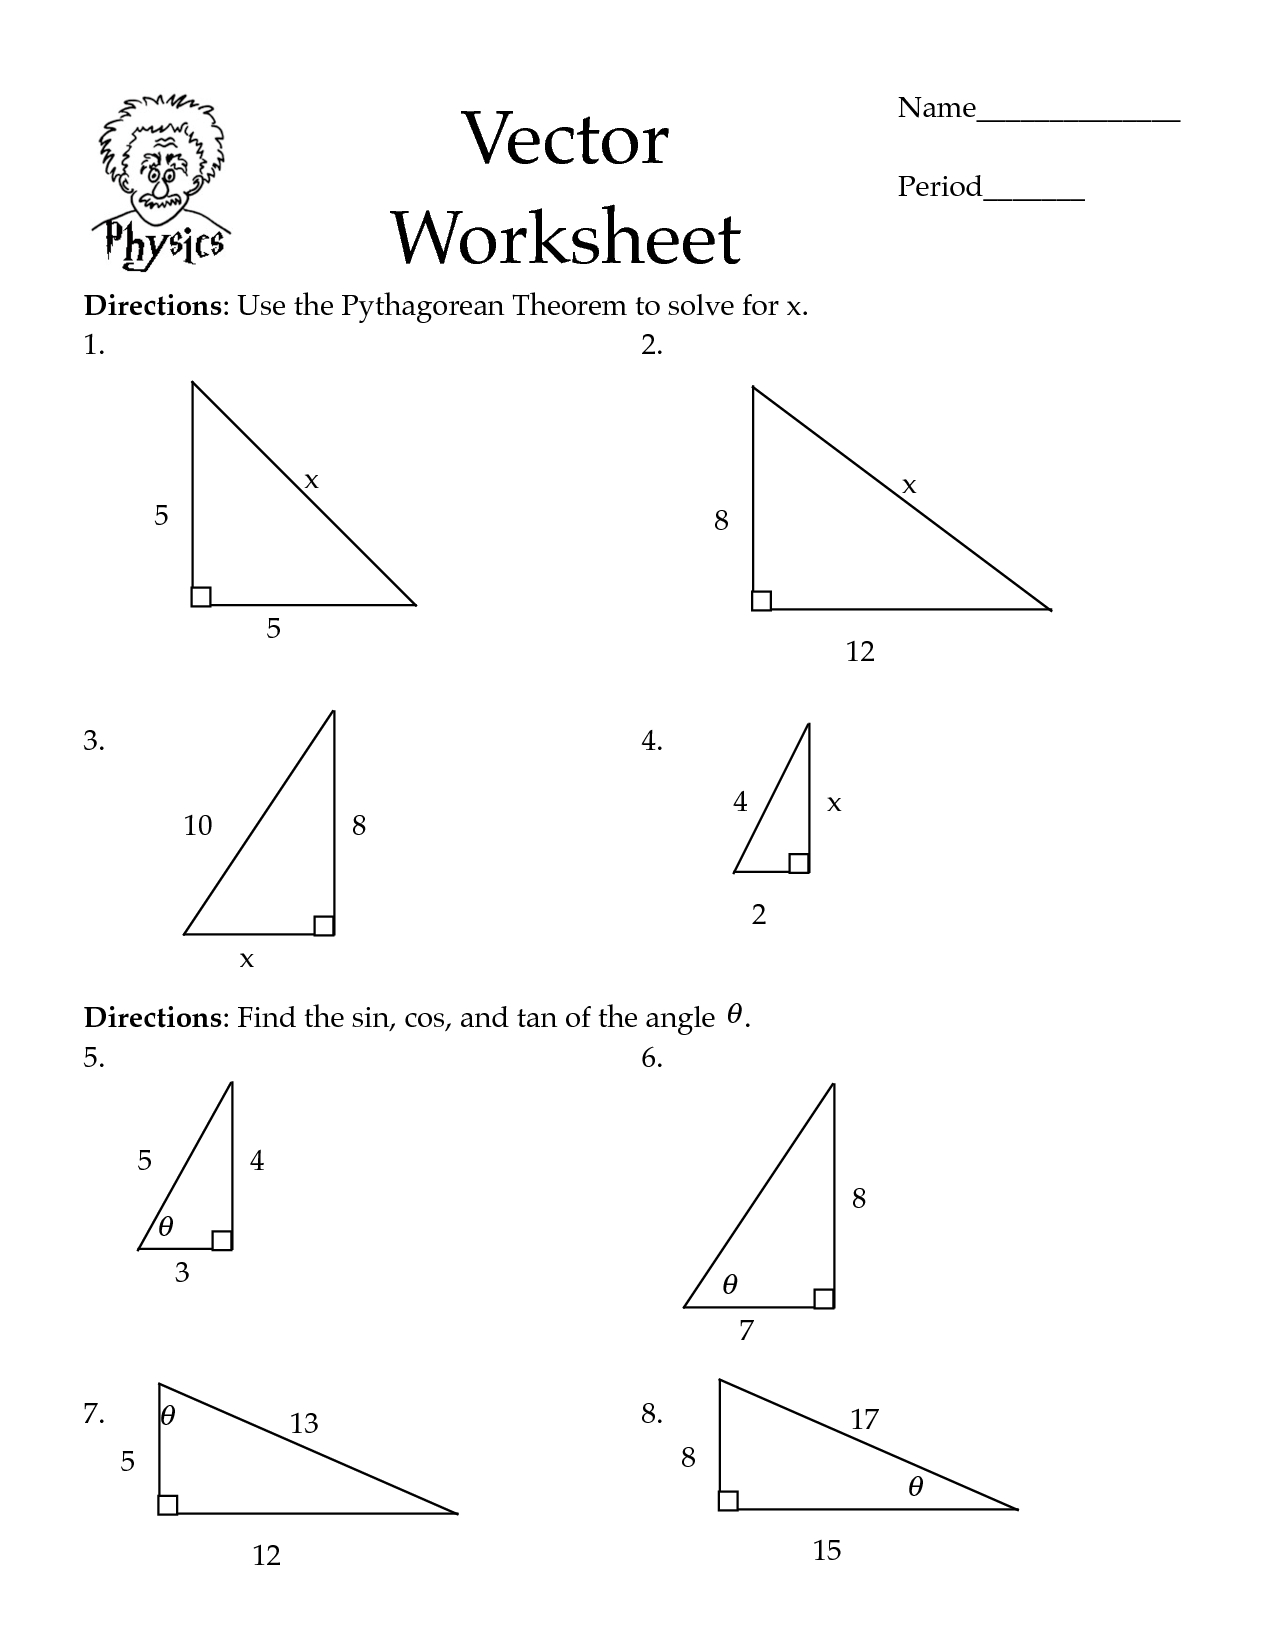 Pythagorean Theorem Worksheets | Cos Law Worksheet - Pdf | Math - Free Printable Pythagorean Theorem Worksheets